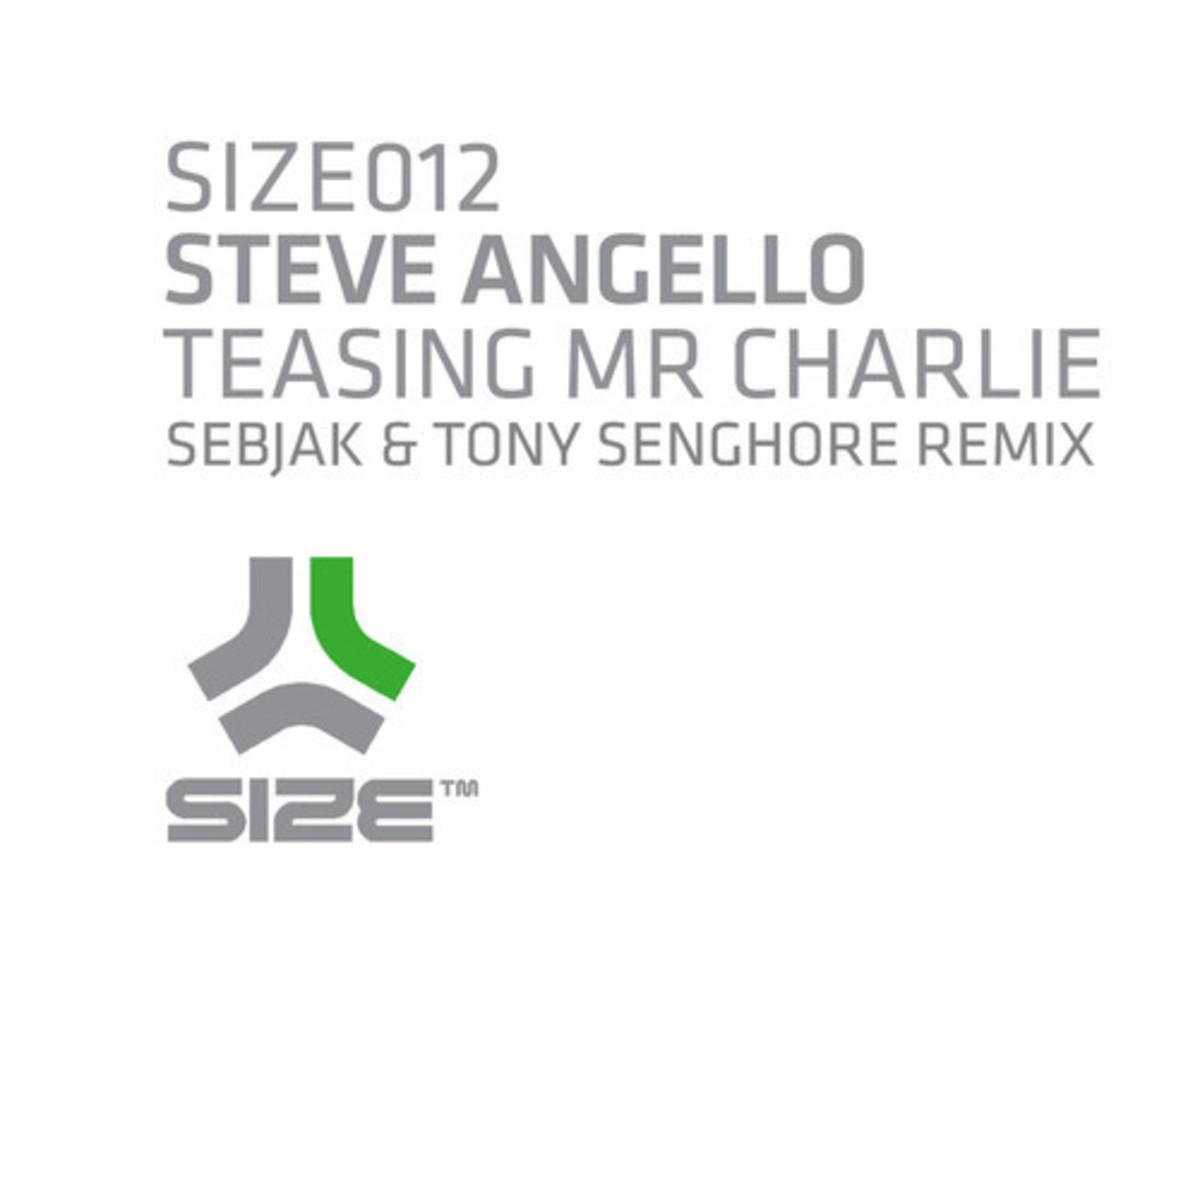 EDM Download: Steve Angello